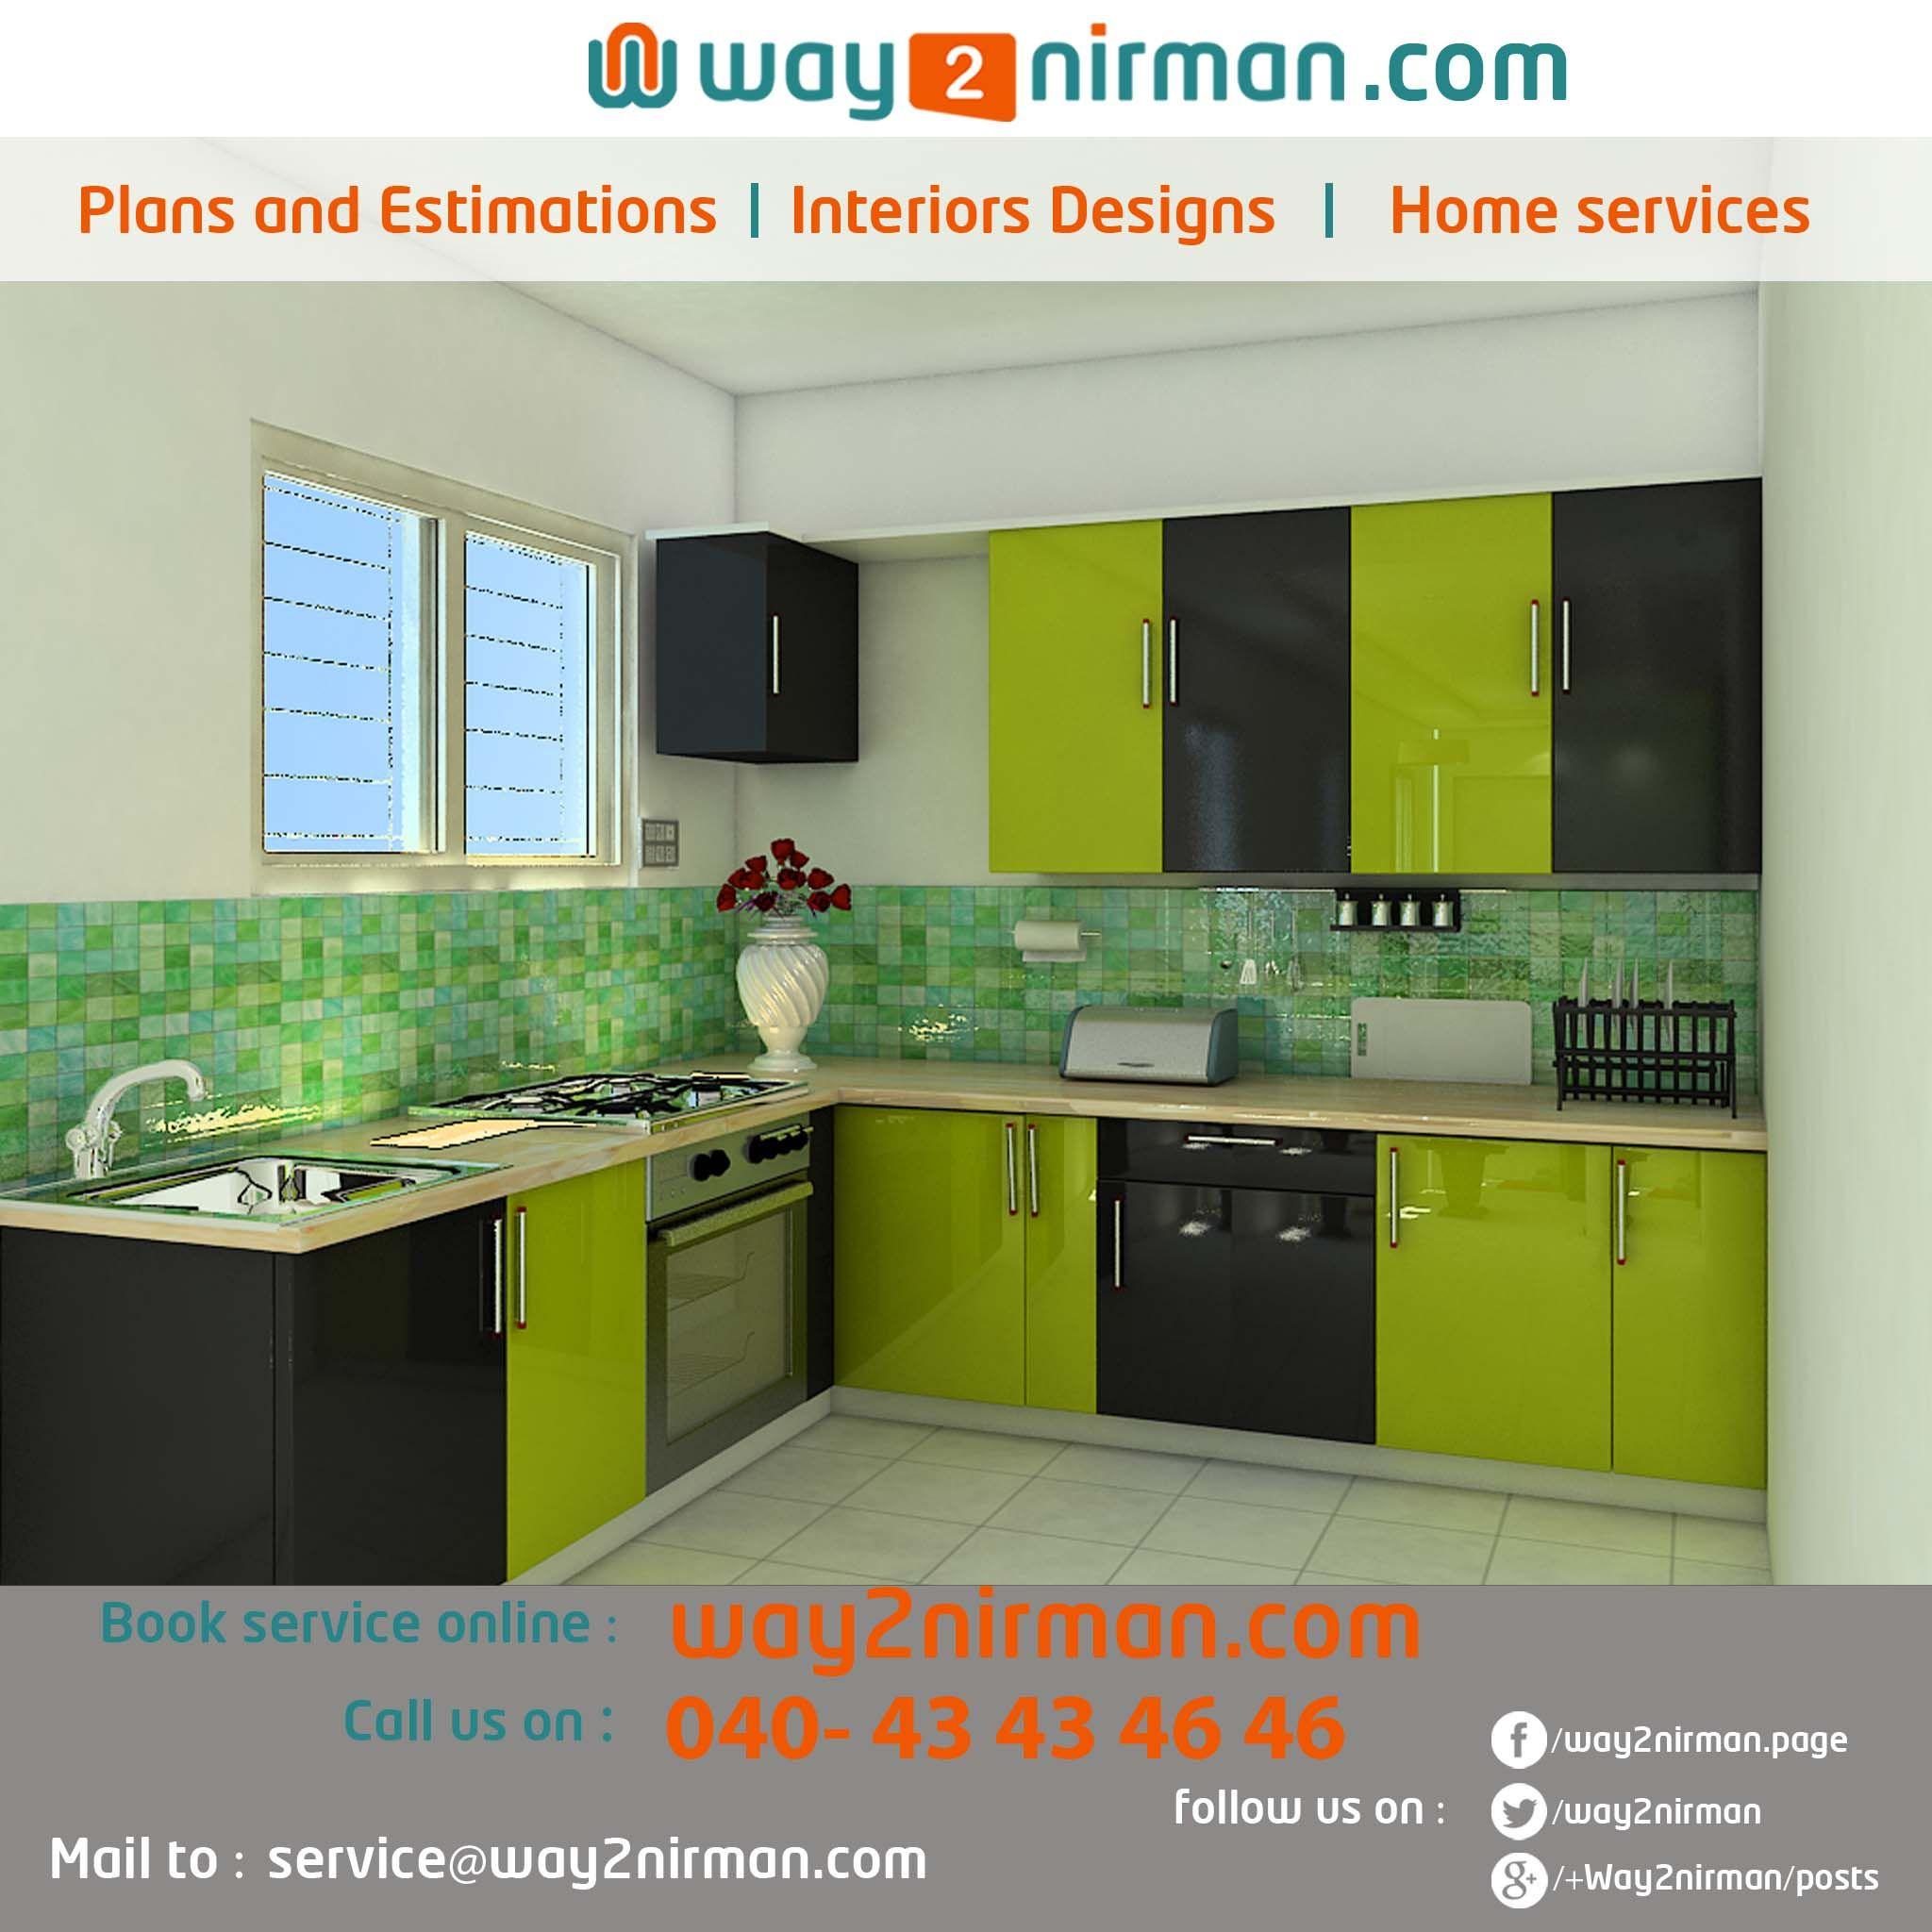 Beautiful Modern Kitchen Design By Way2nirman.com